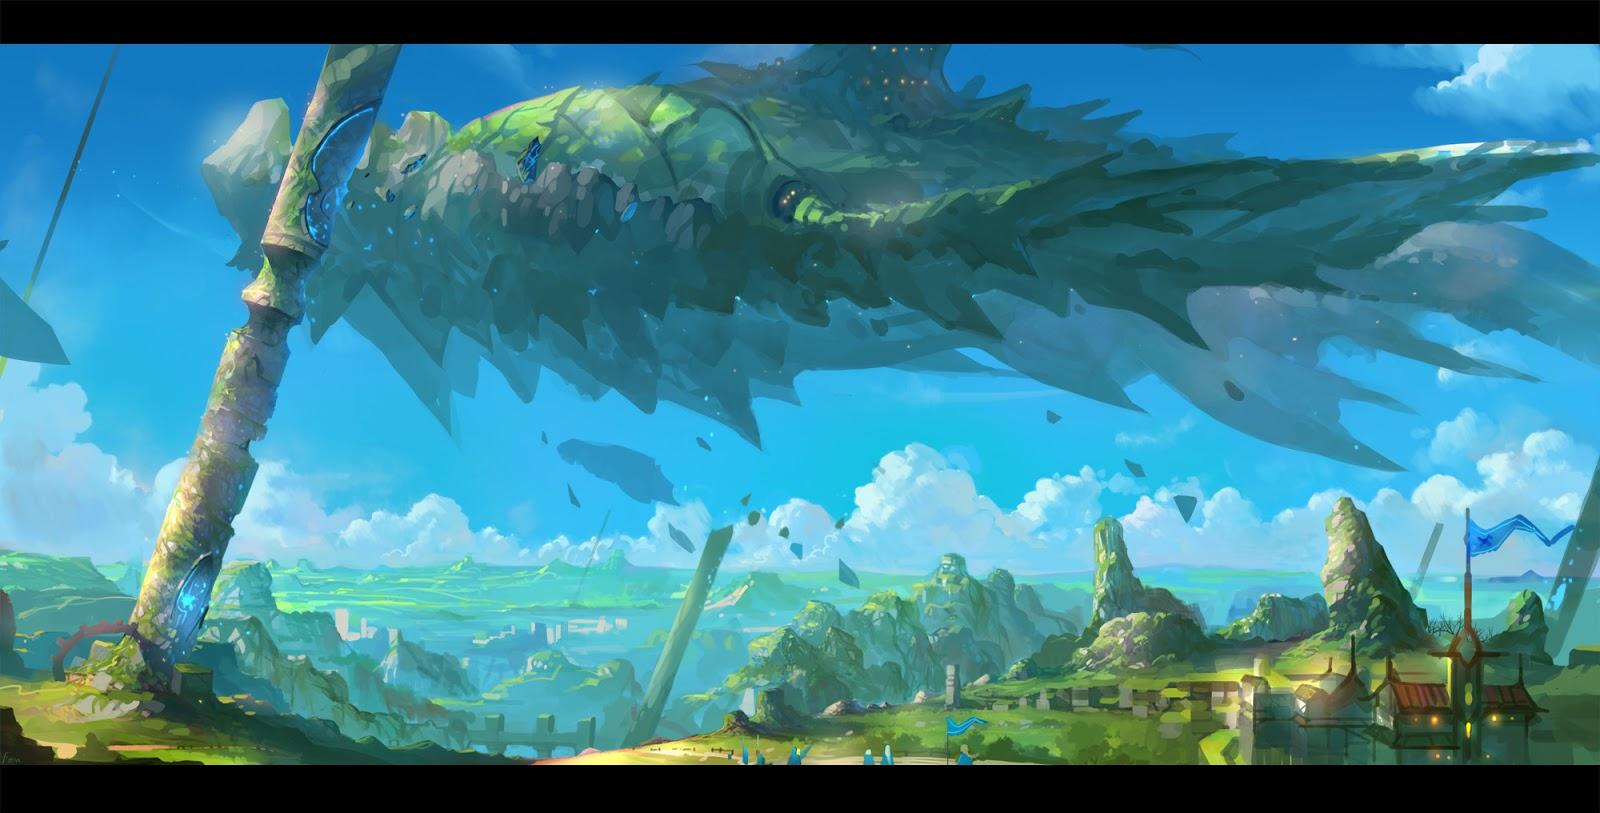 Anime Landscape Scenery